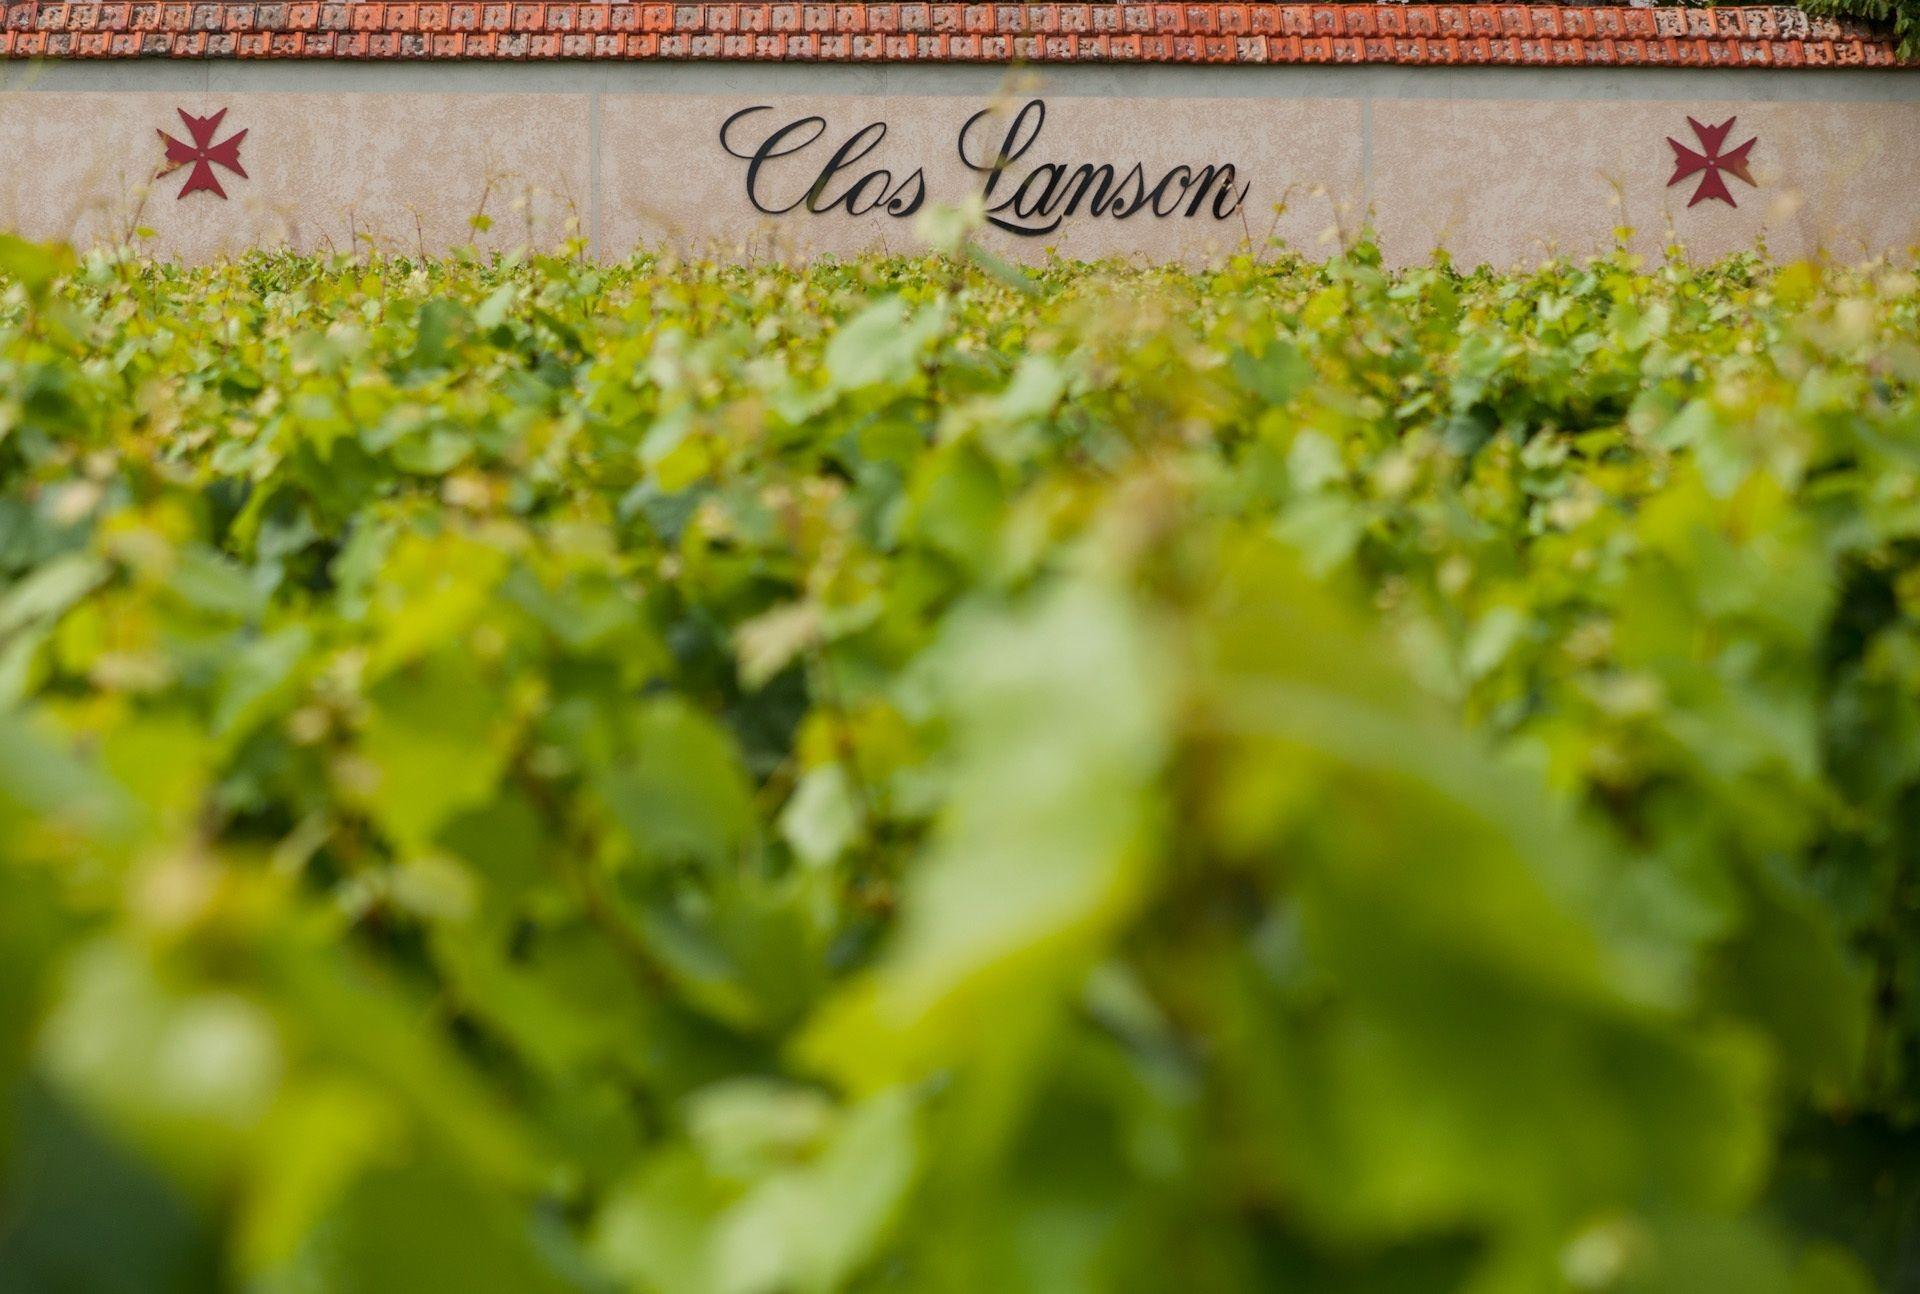 Champagne #lanson #wine